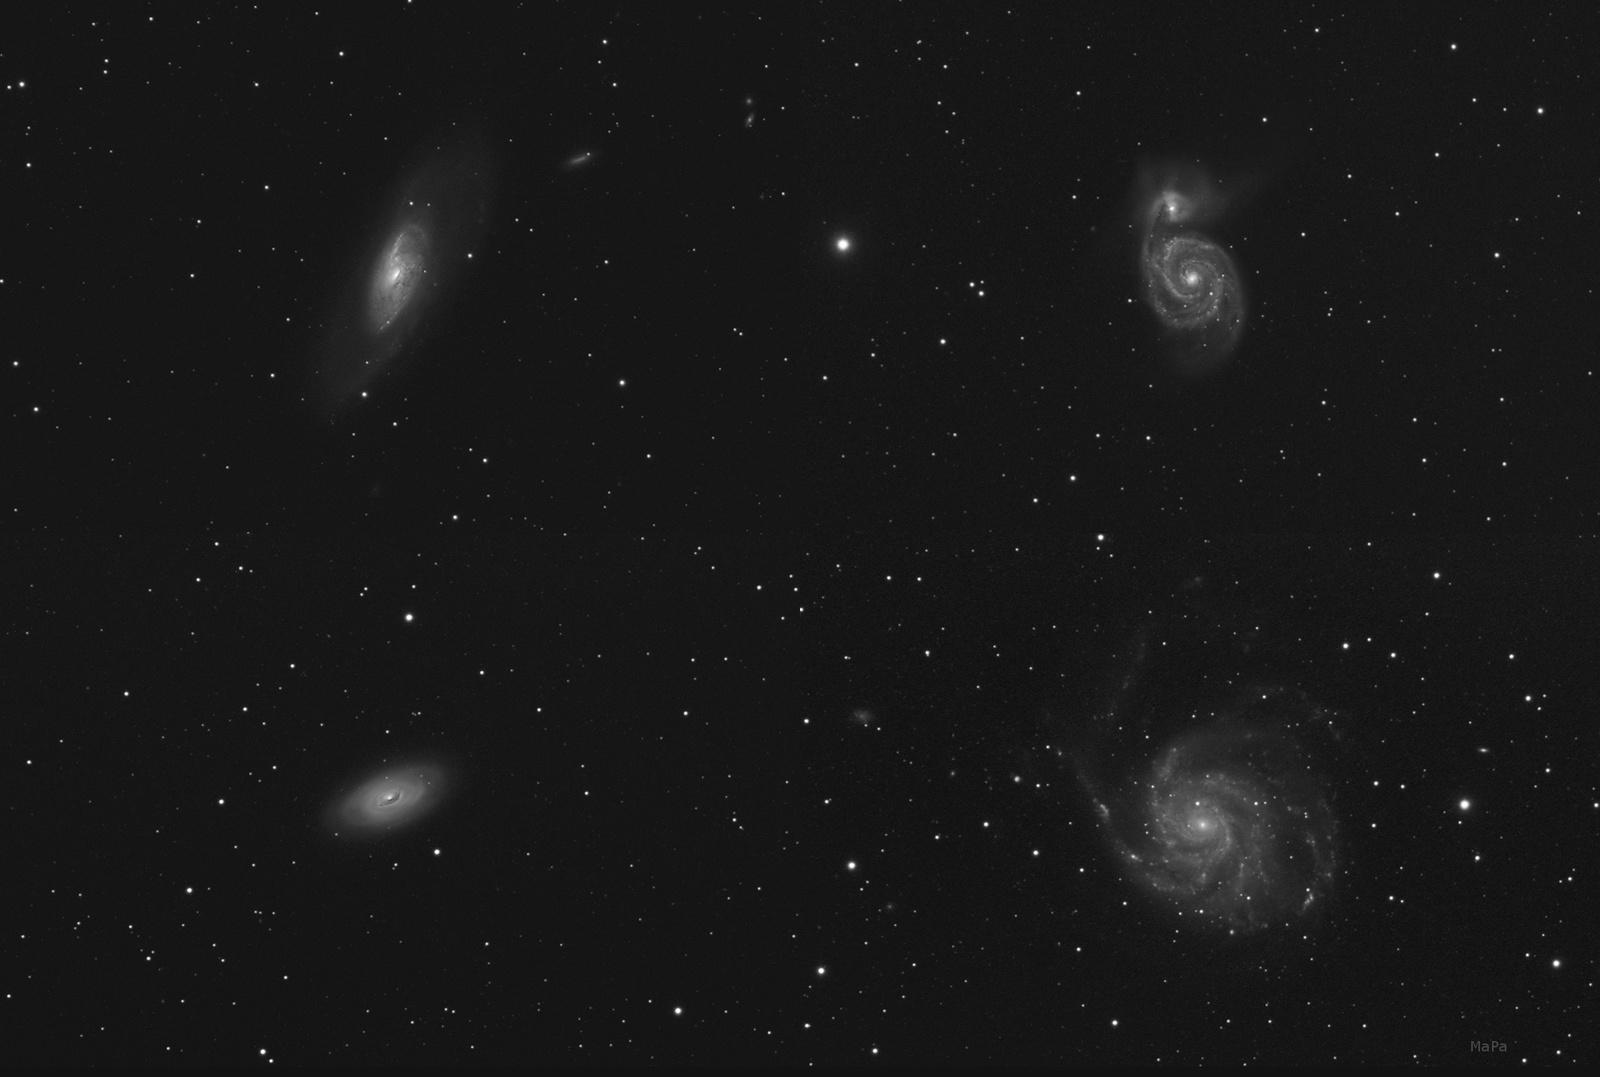 4Galaxies_2018_sky90_asi16_mono.thumb.jpg.415fad6c075eab0928c2666f3d5c3671.jpg